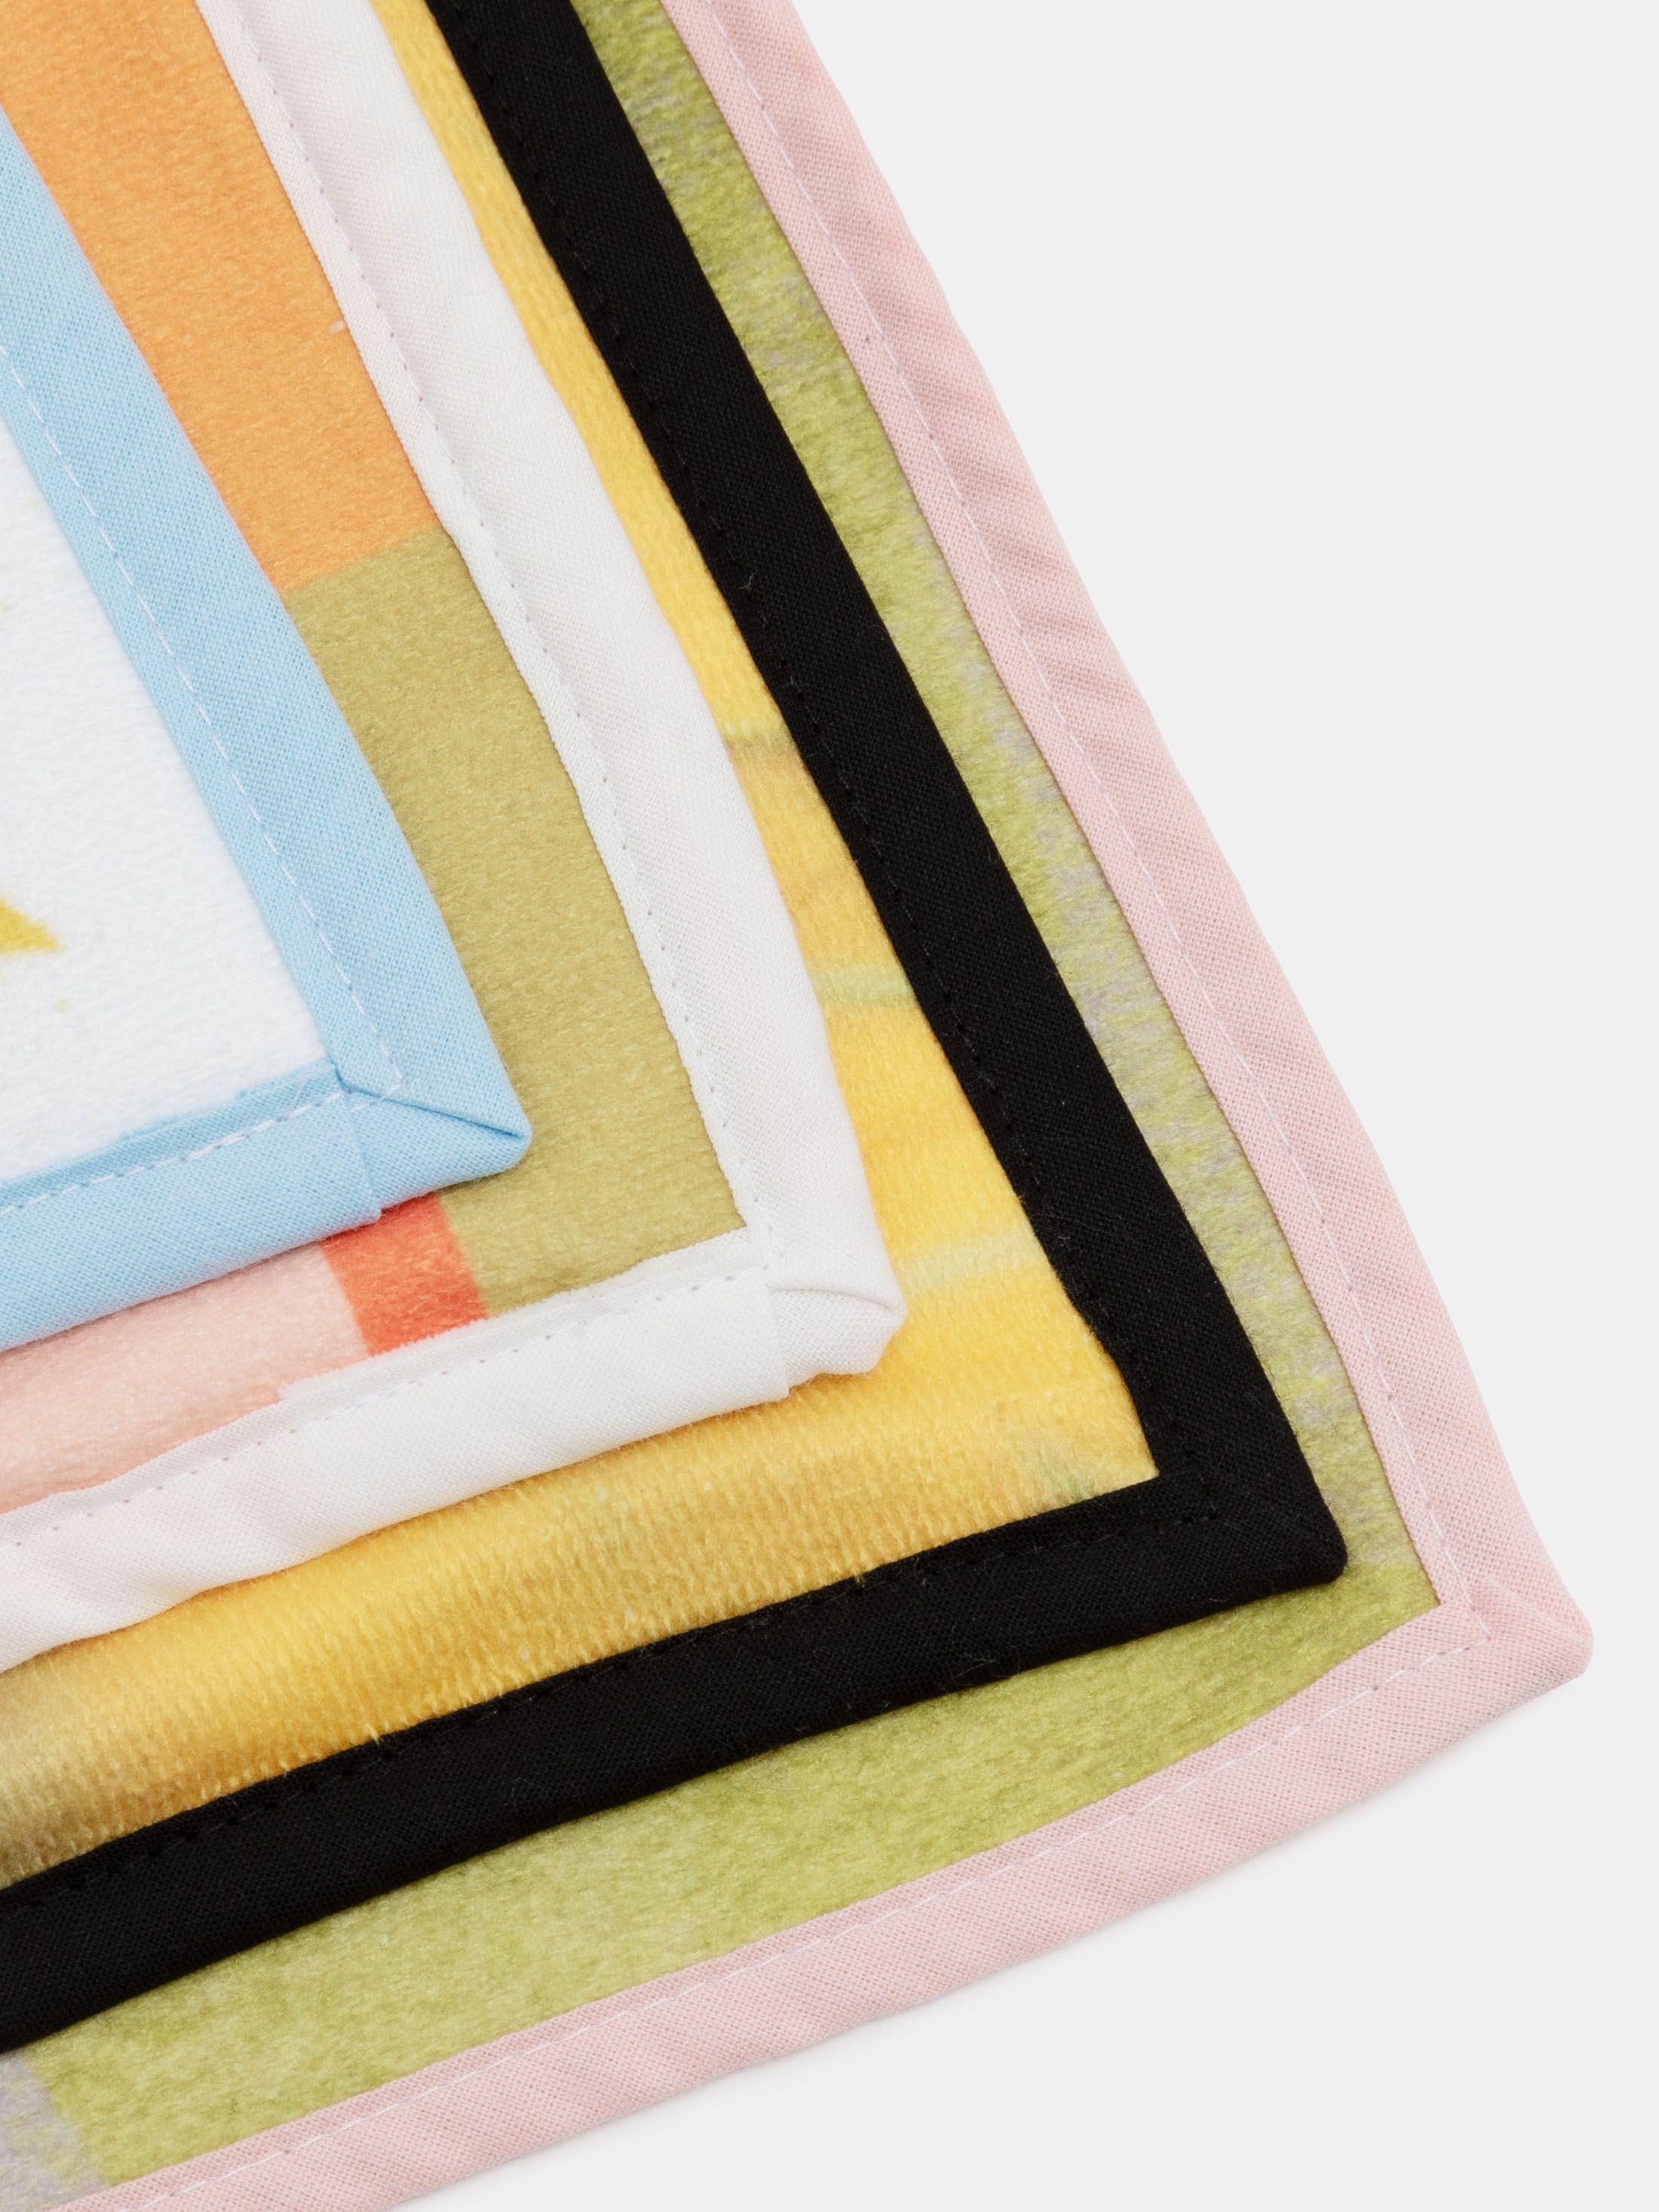 customised towels binding options